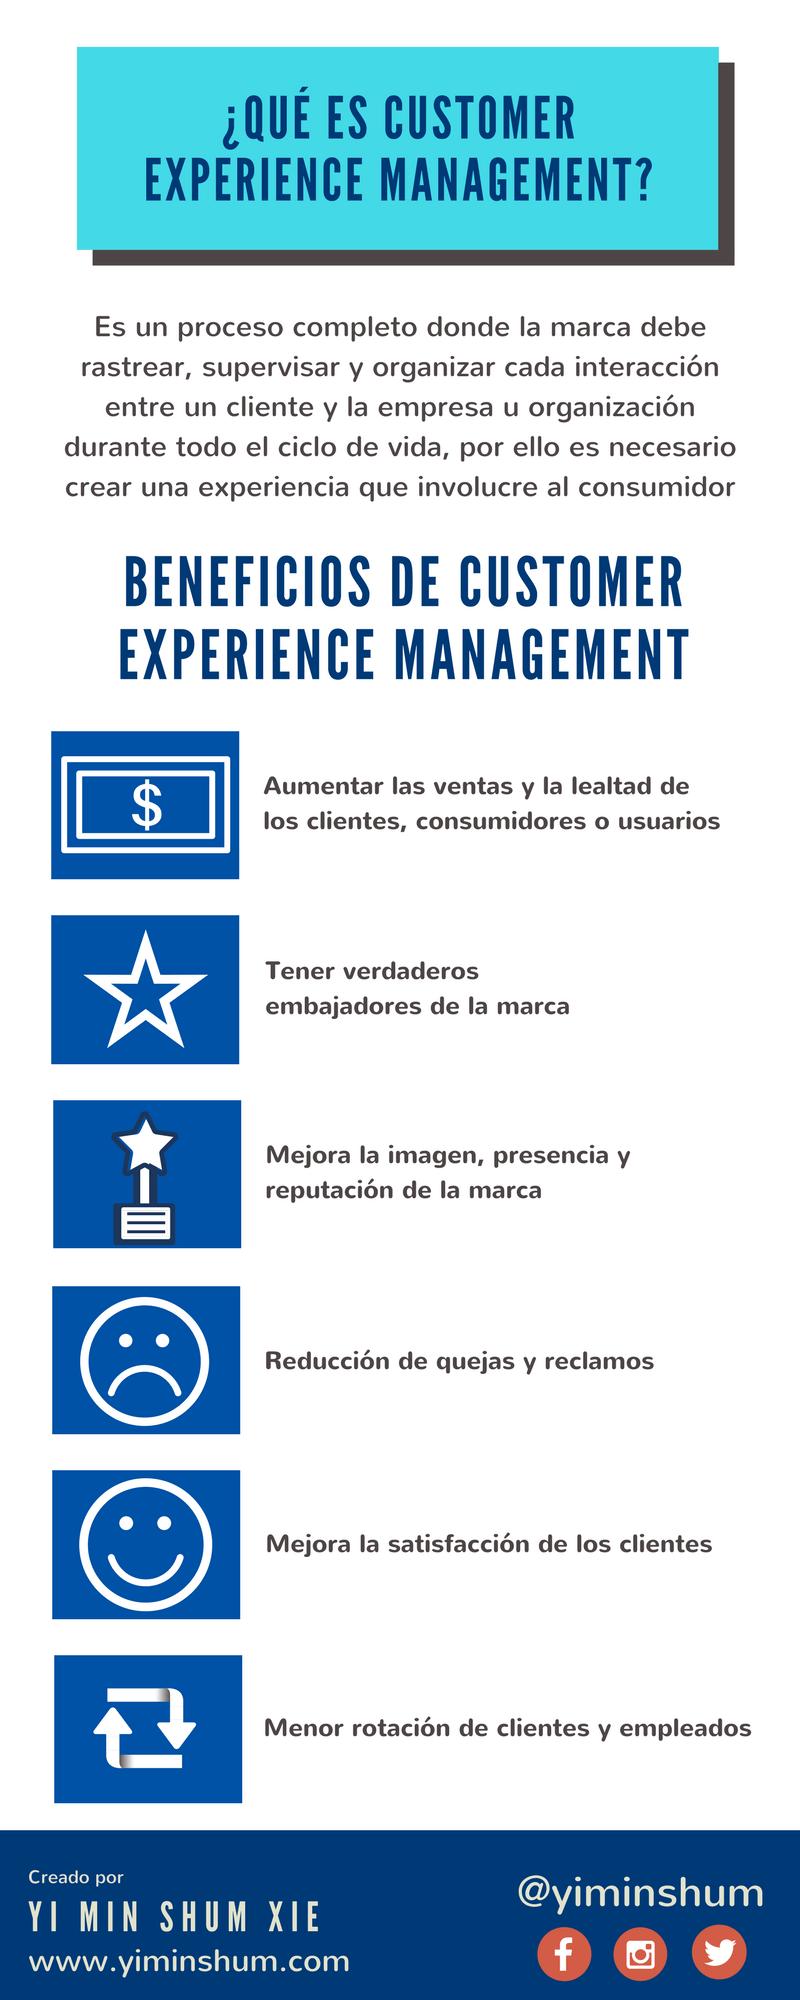 ¿Qué es Customer Experience Management? imagen